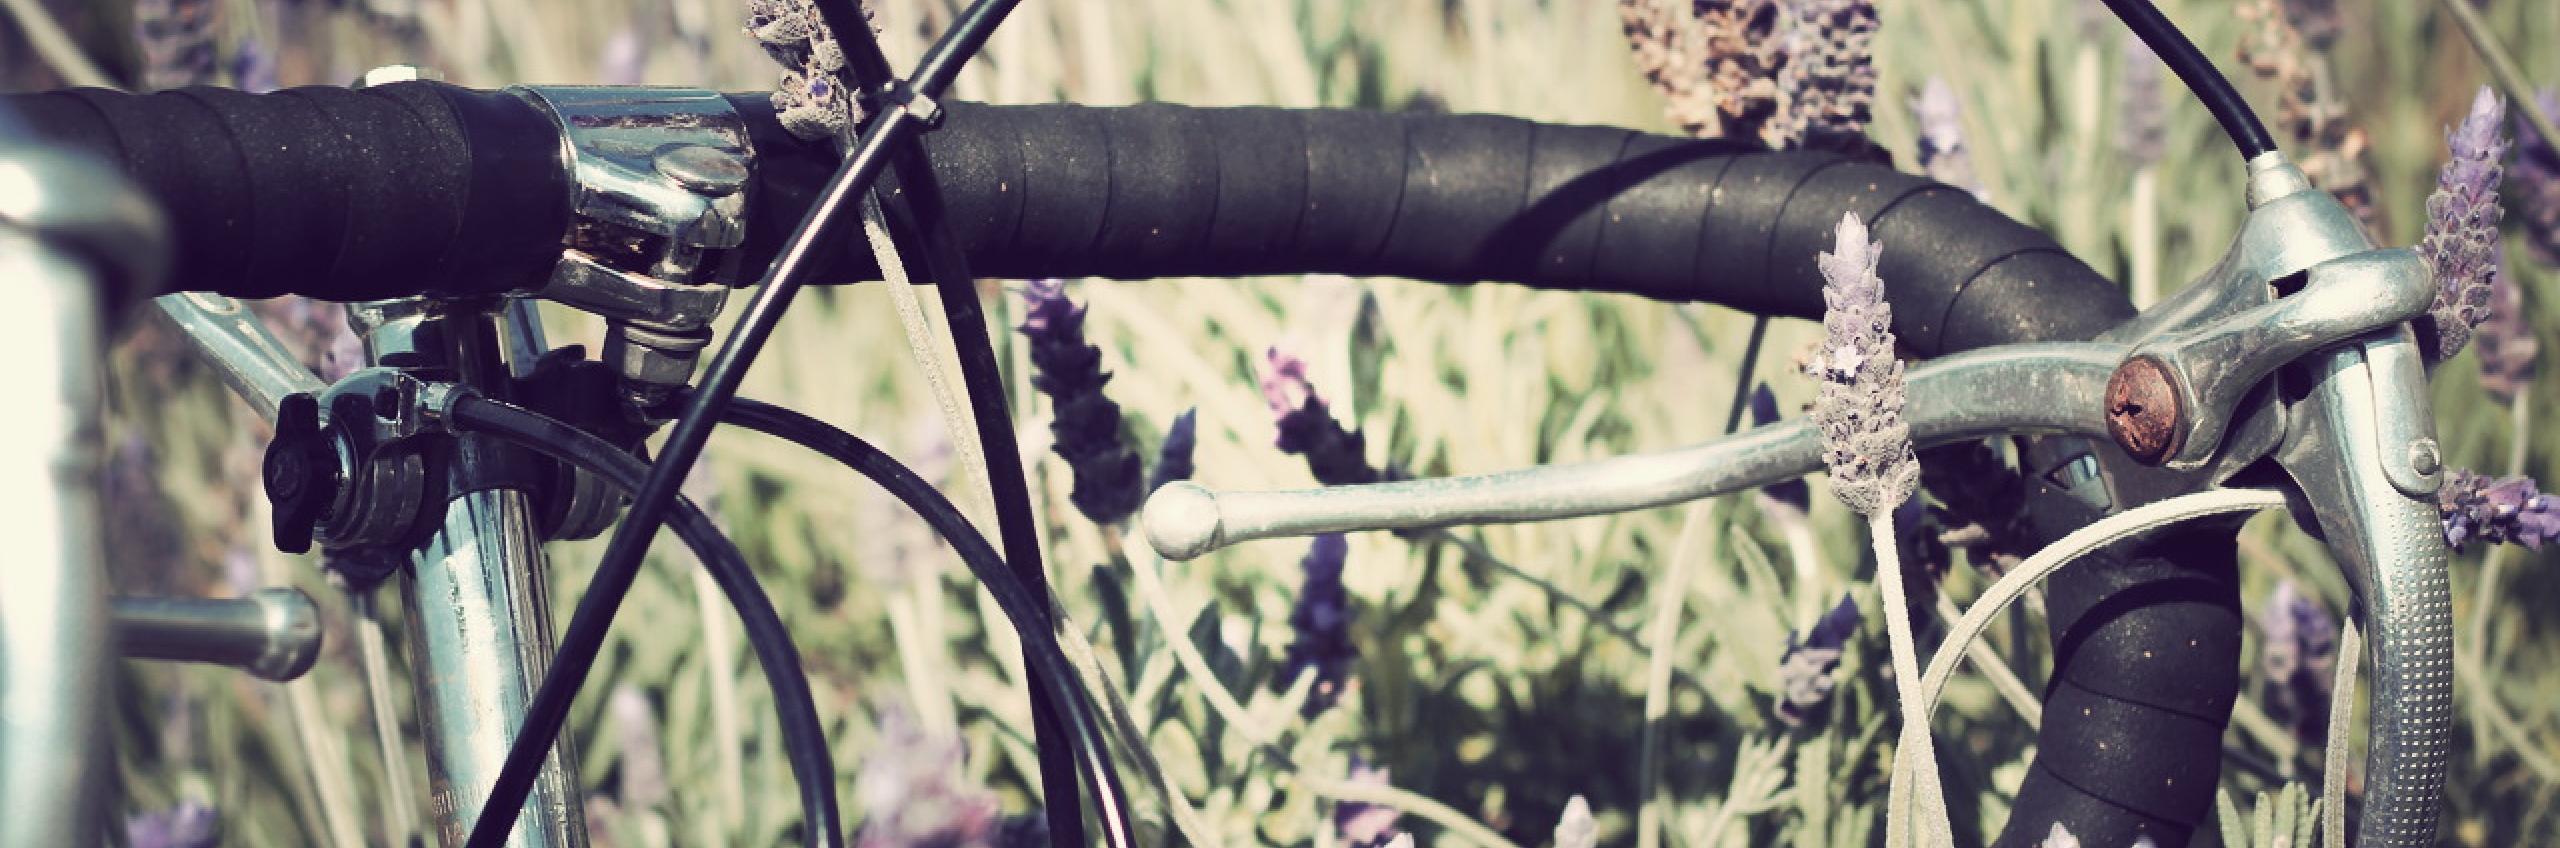 Biking Hvar - A setting so pretty, it looks fake